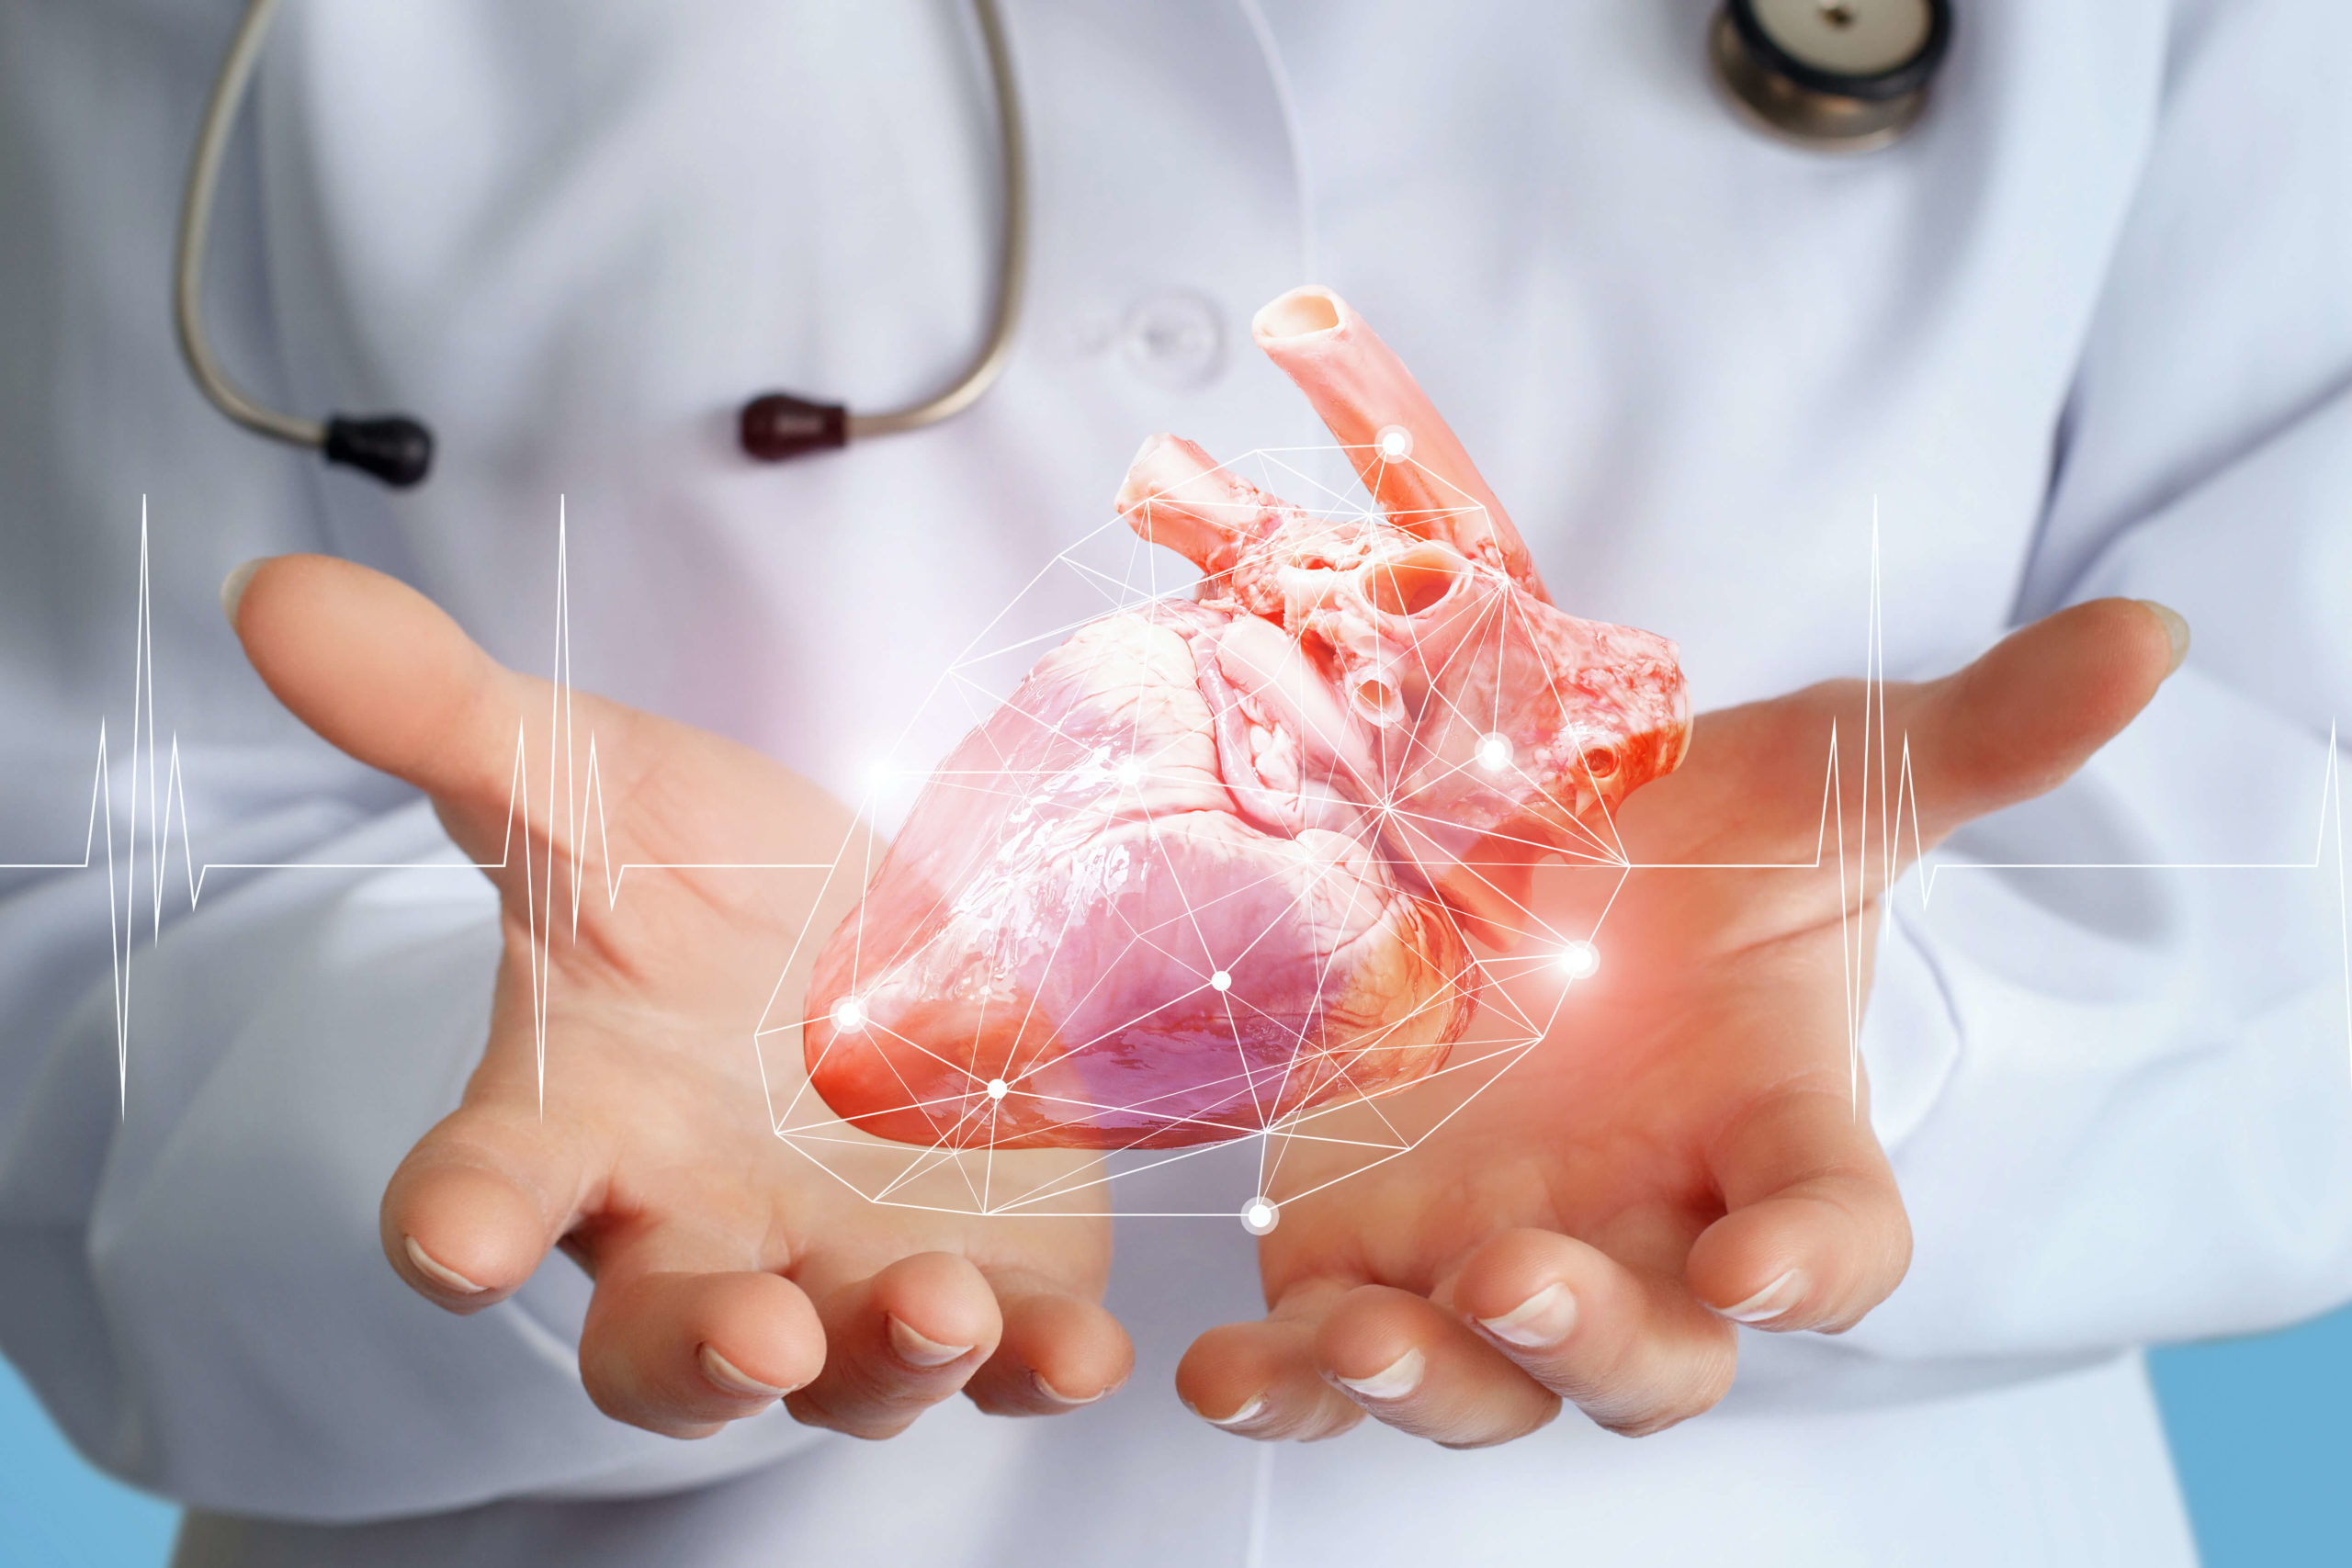 imaginär konstruiertes Herz in Männerhand